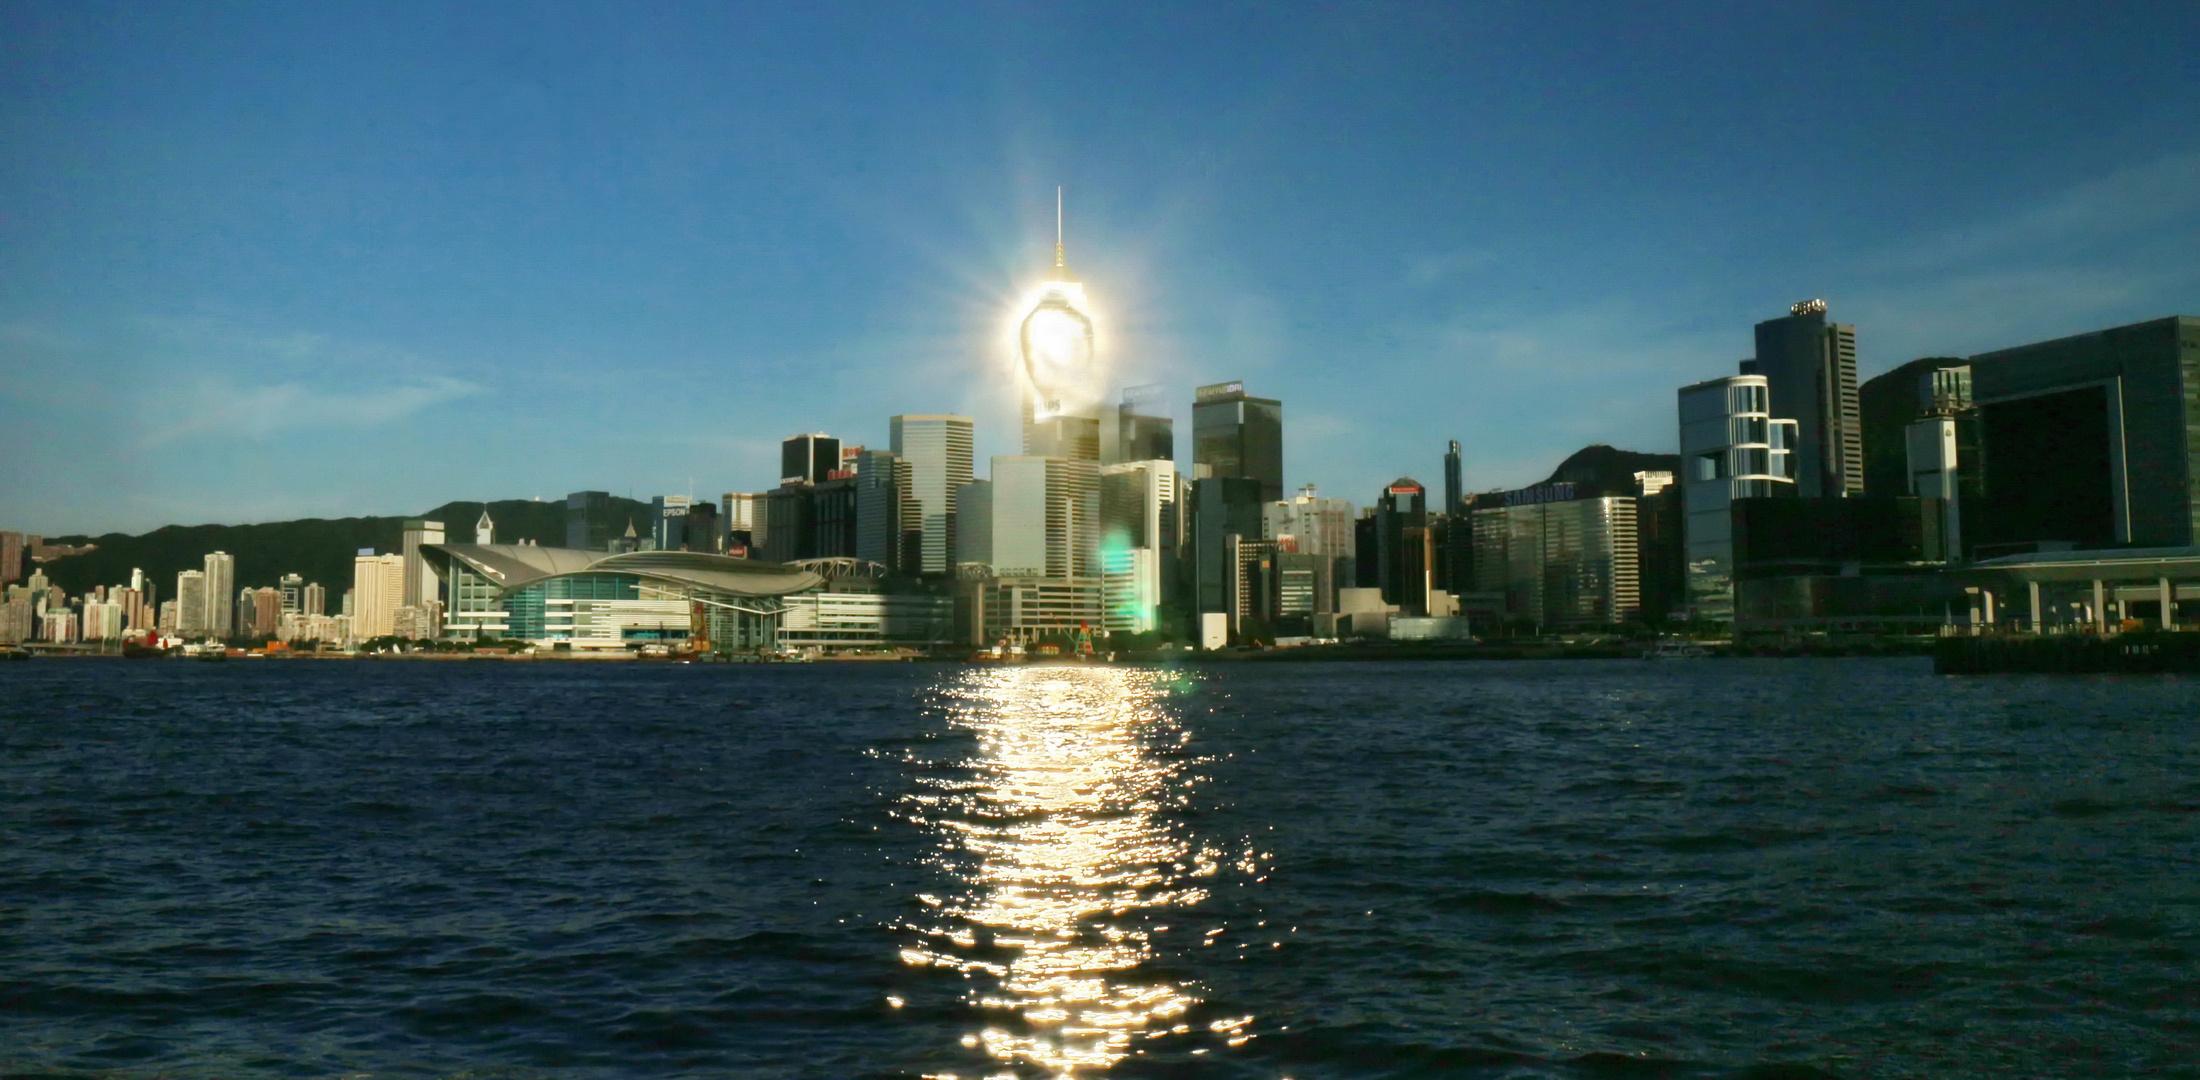 Hongkong lighthouse